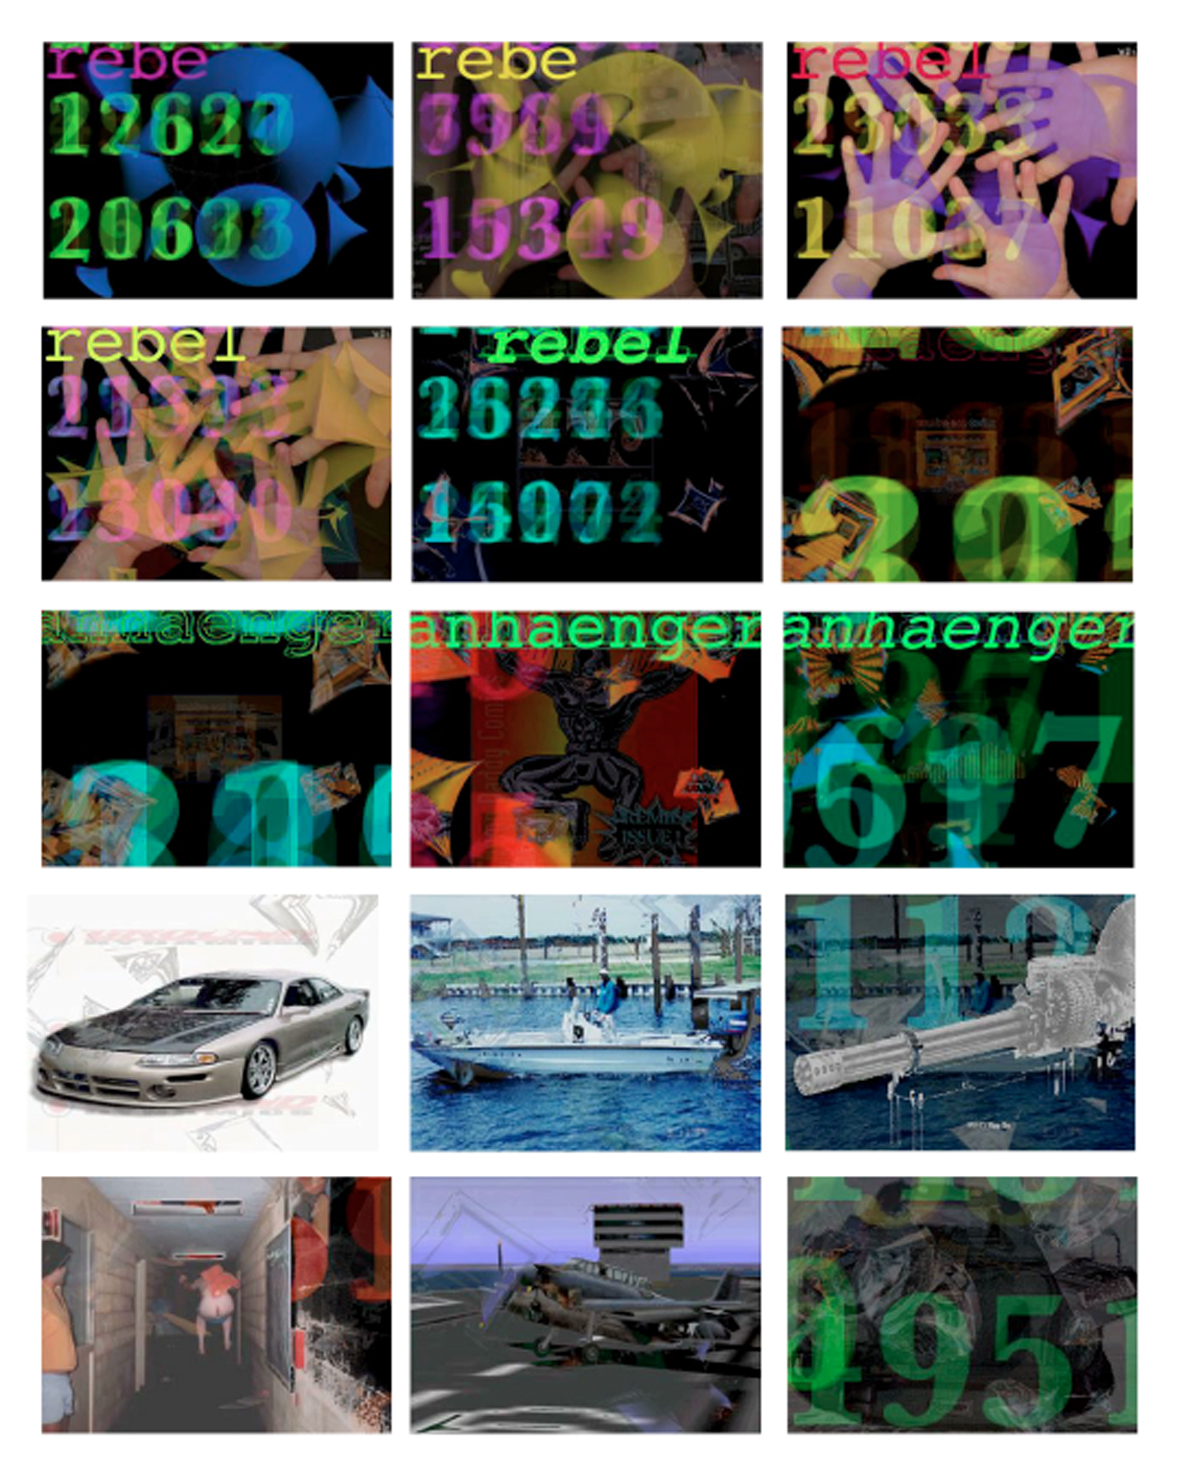 KeyWorx screen shot sequence